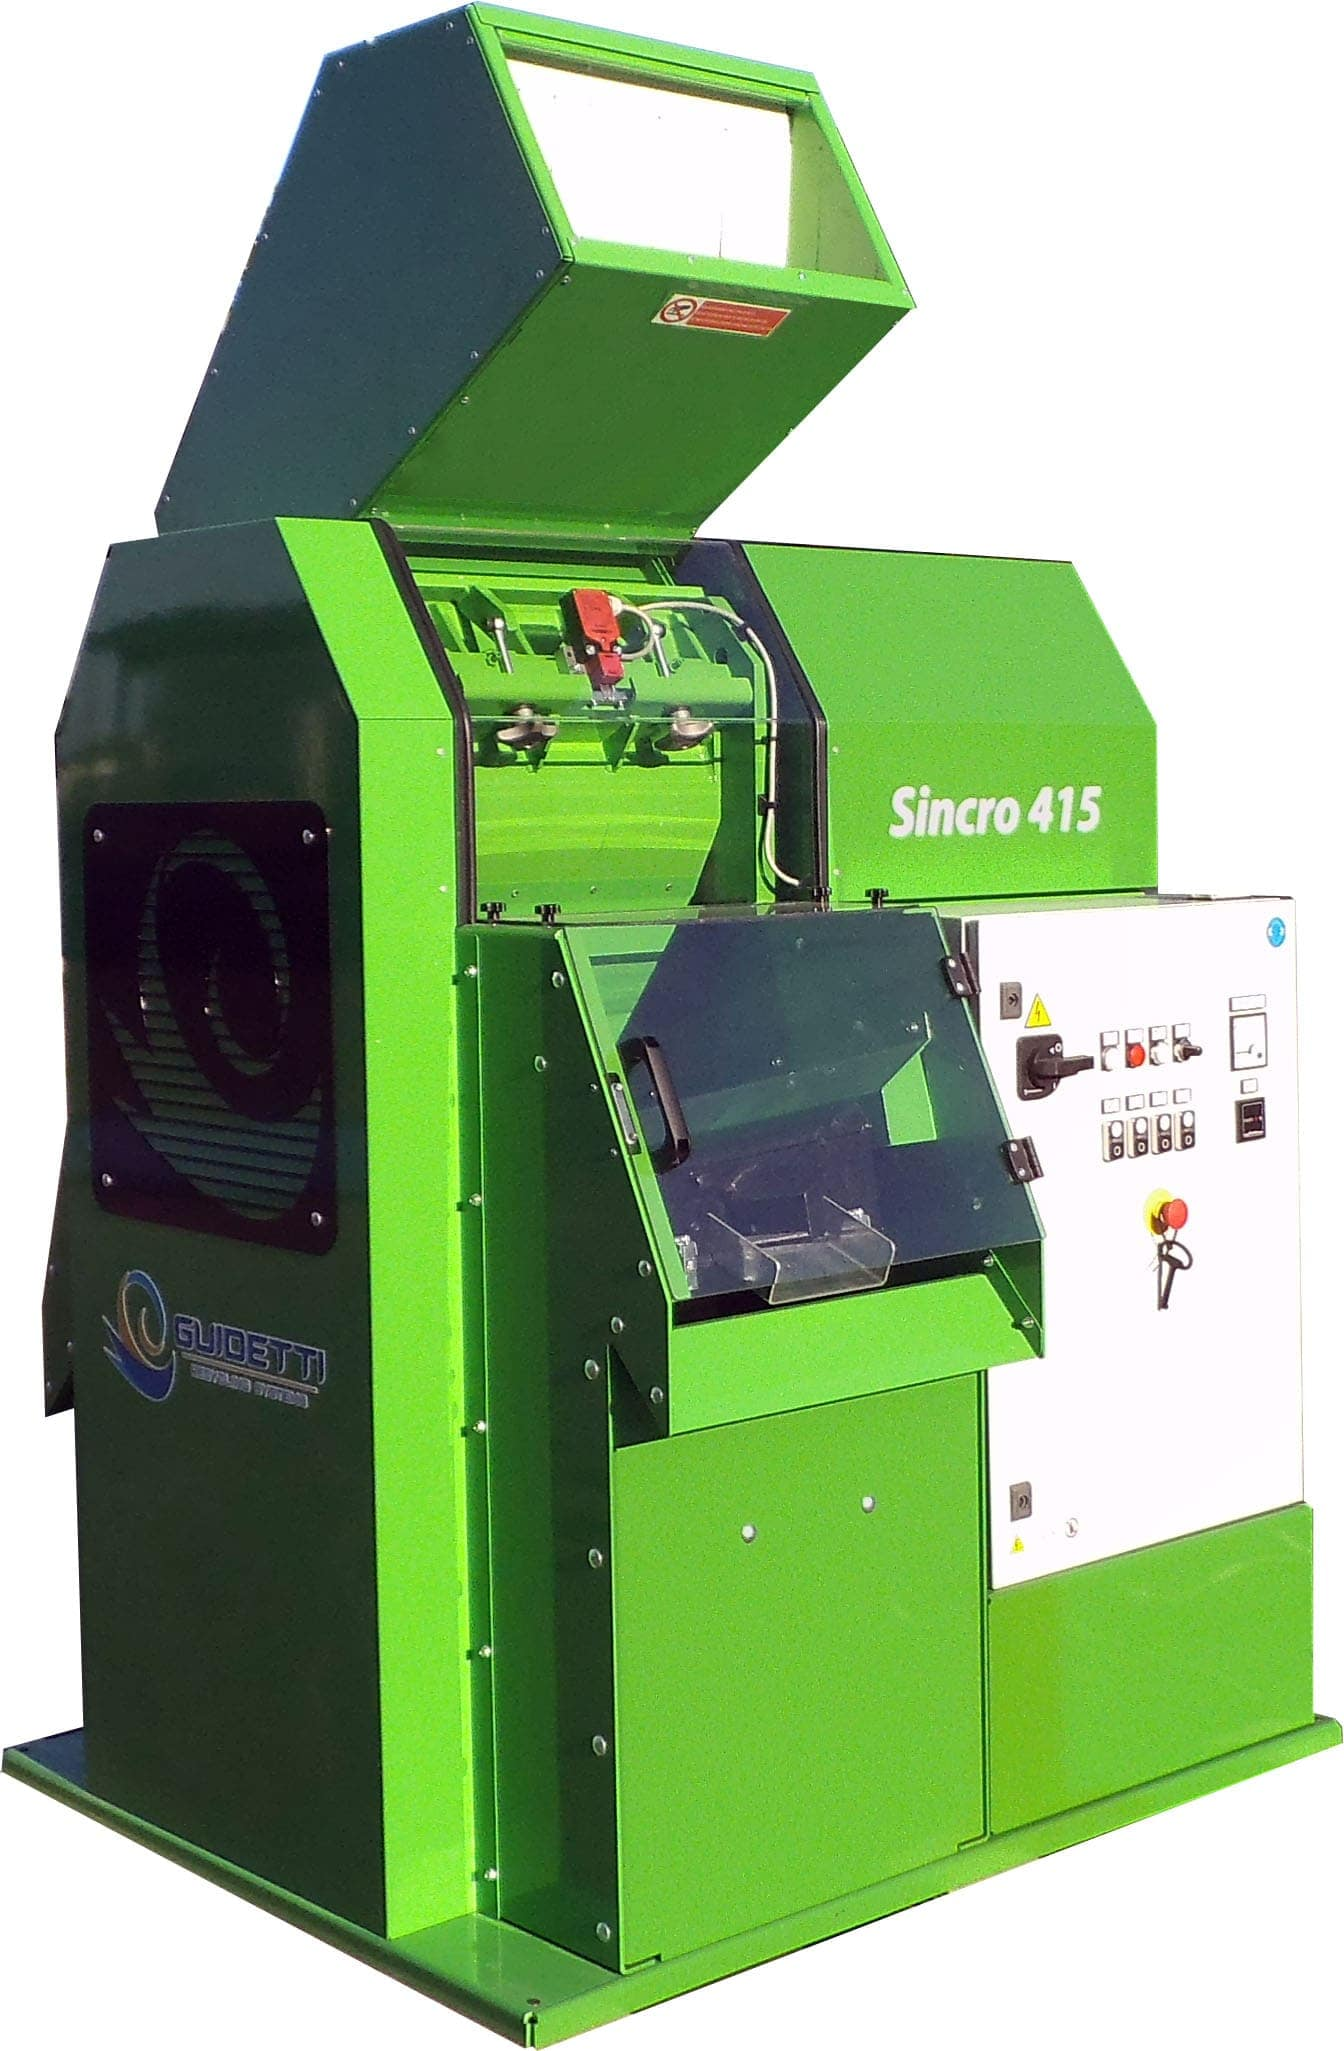 Sincro 415